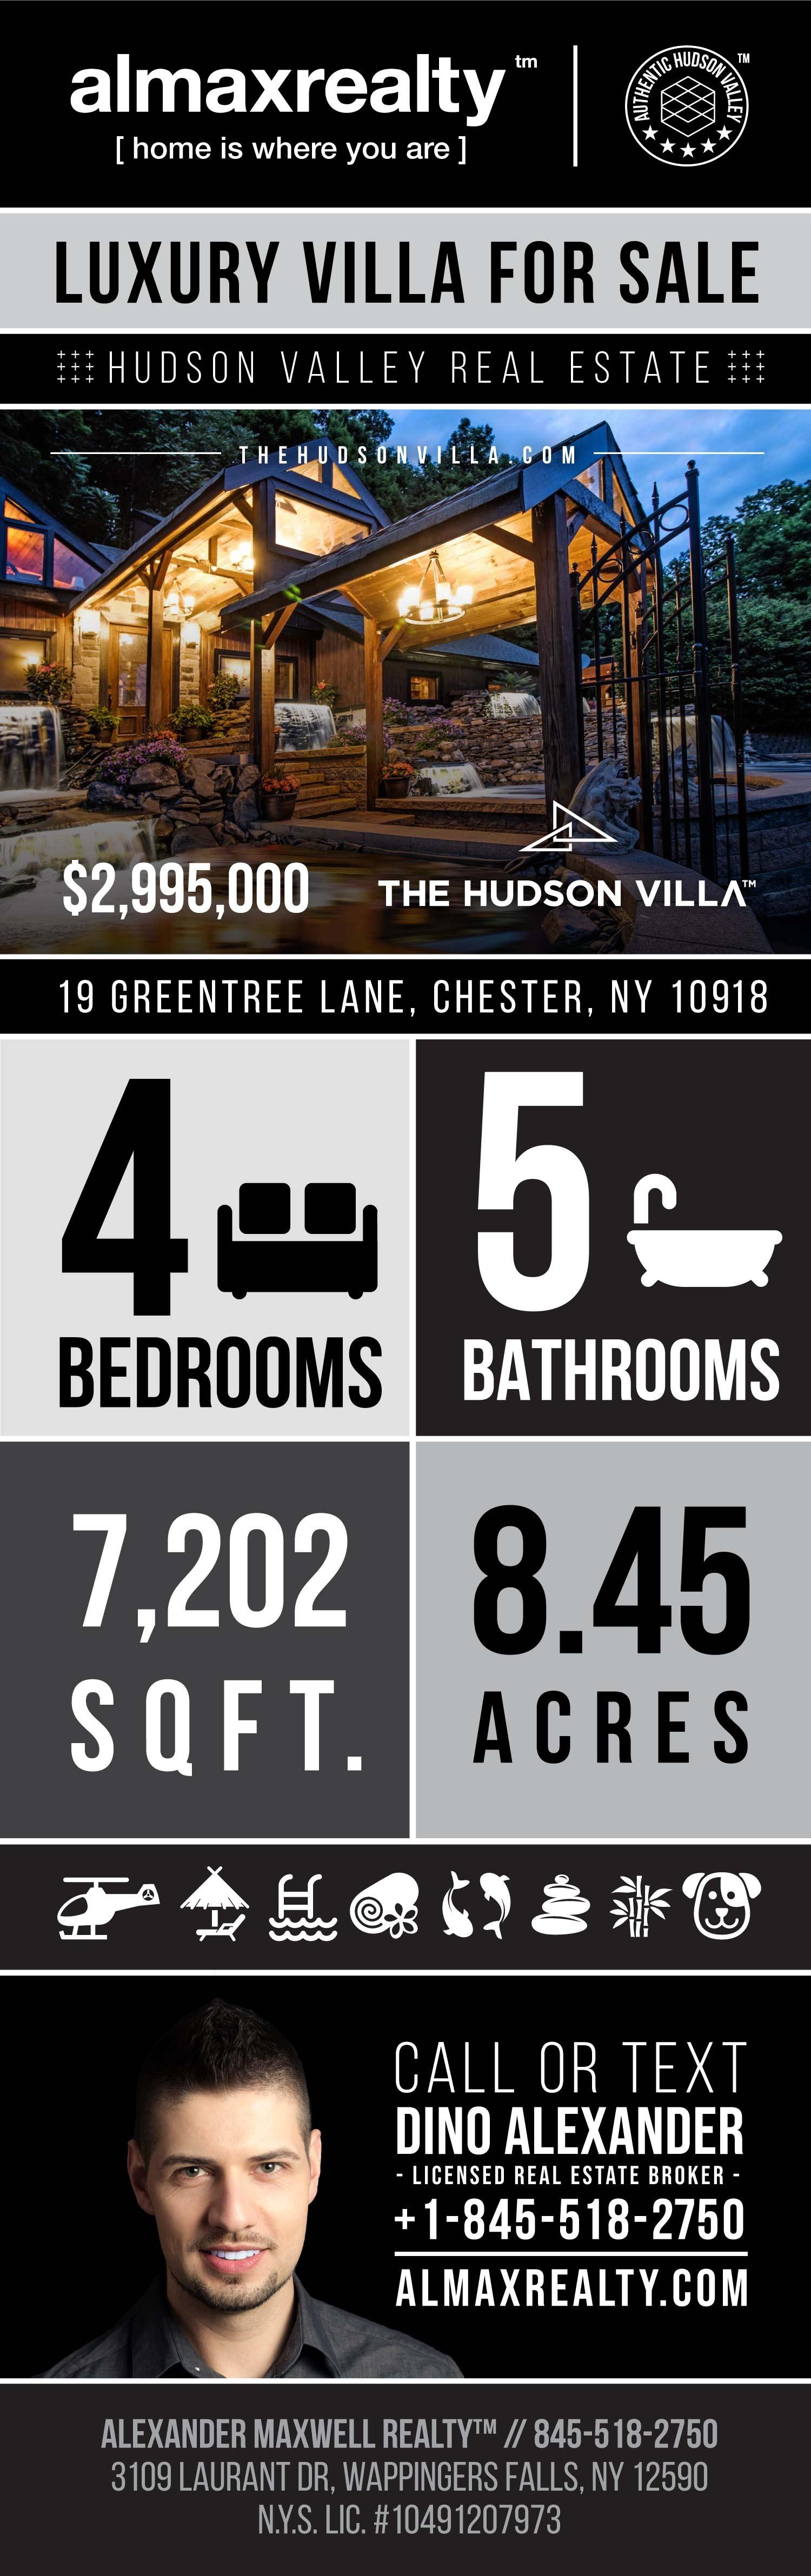 Luxury Hudson Valley ViIla for Sale